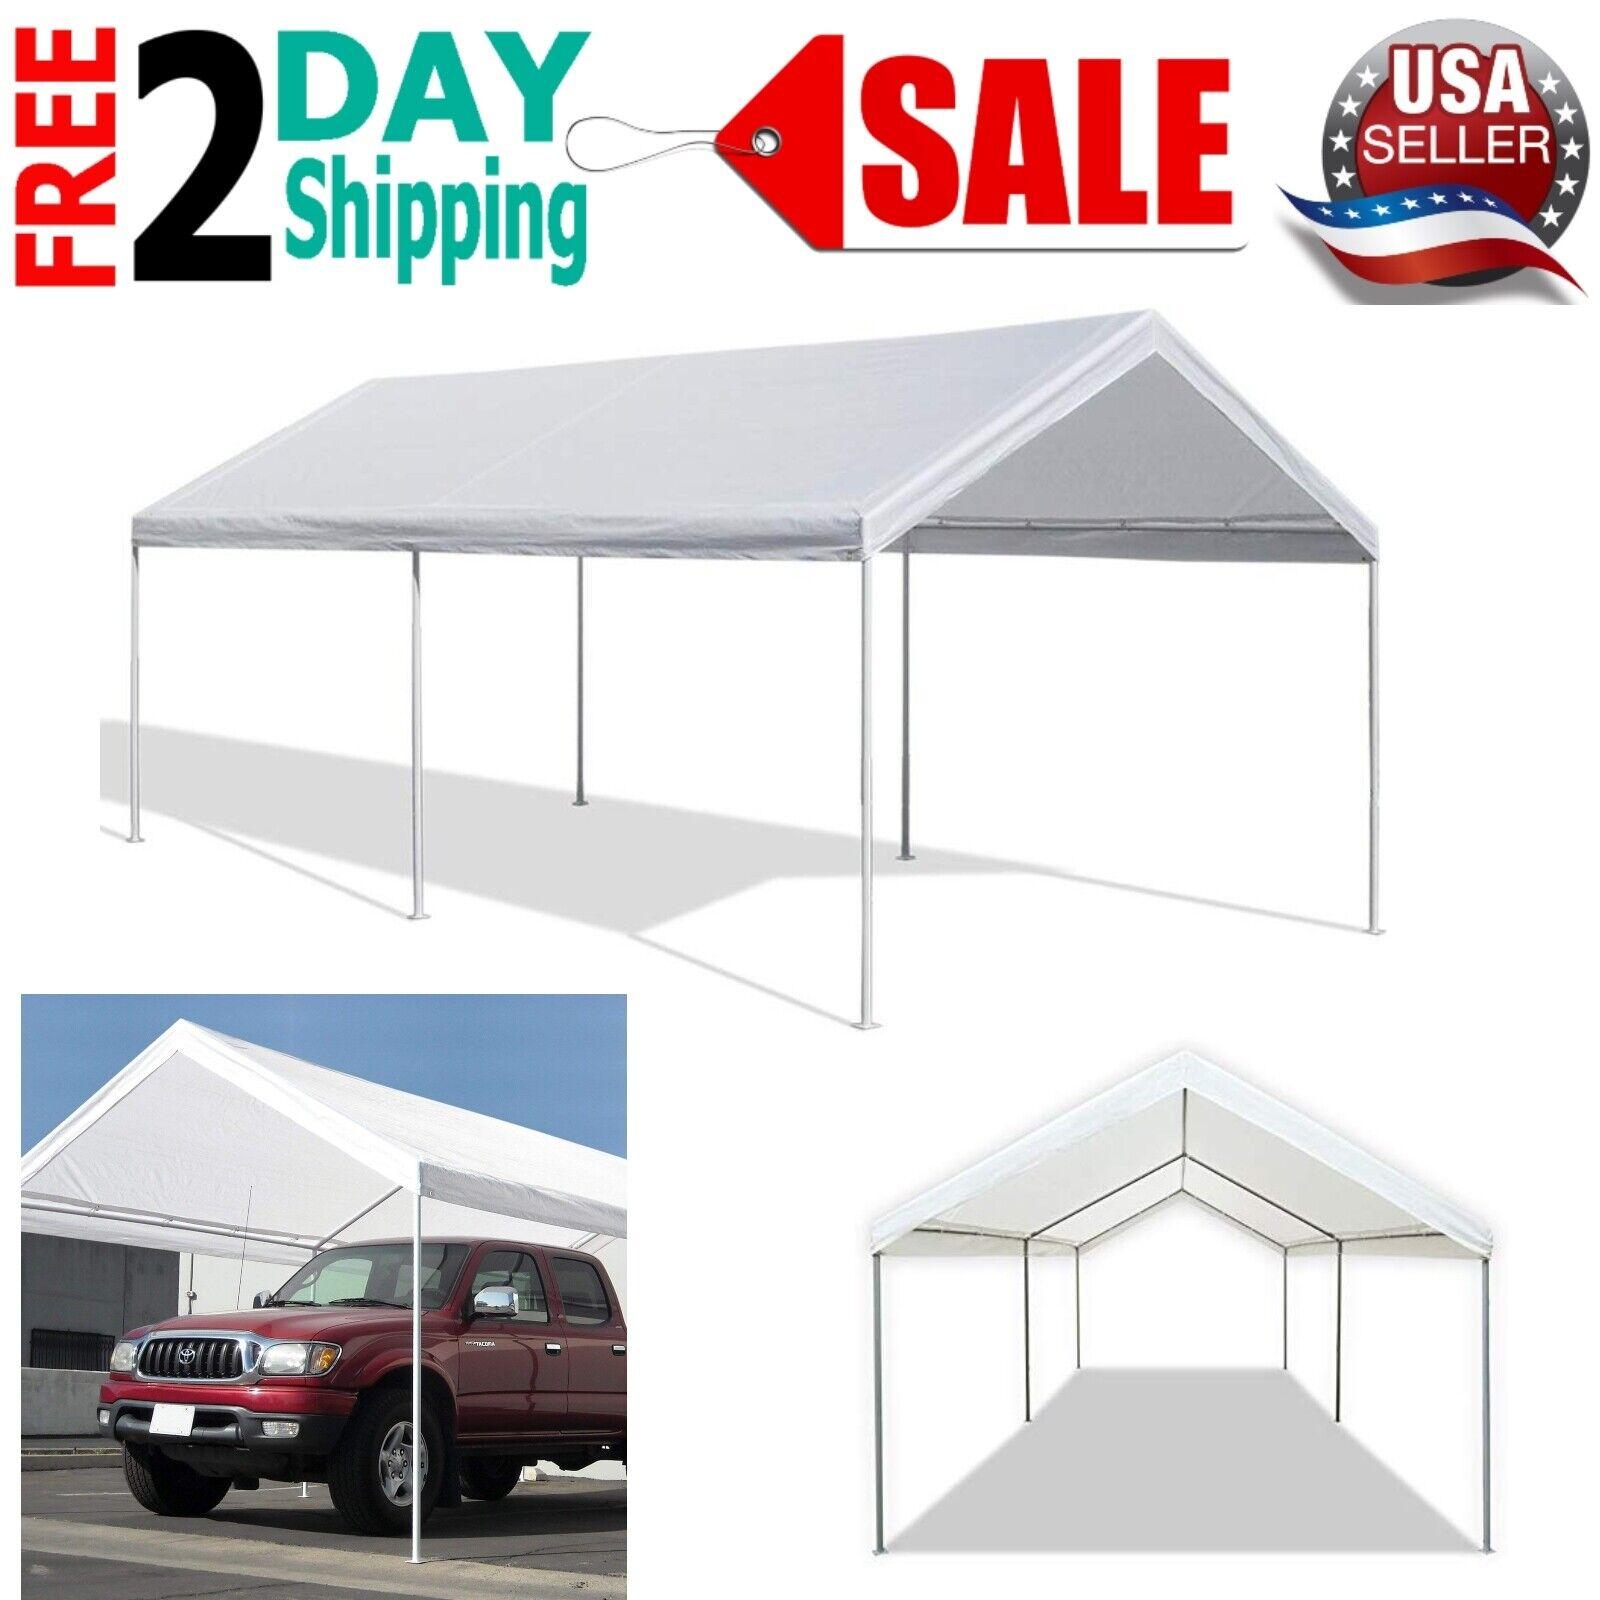 Carport Canopy Tent 10 X 20 Feet Domain White Portable Garag